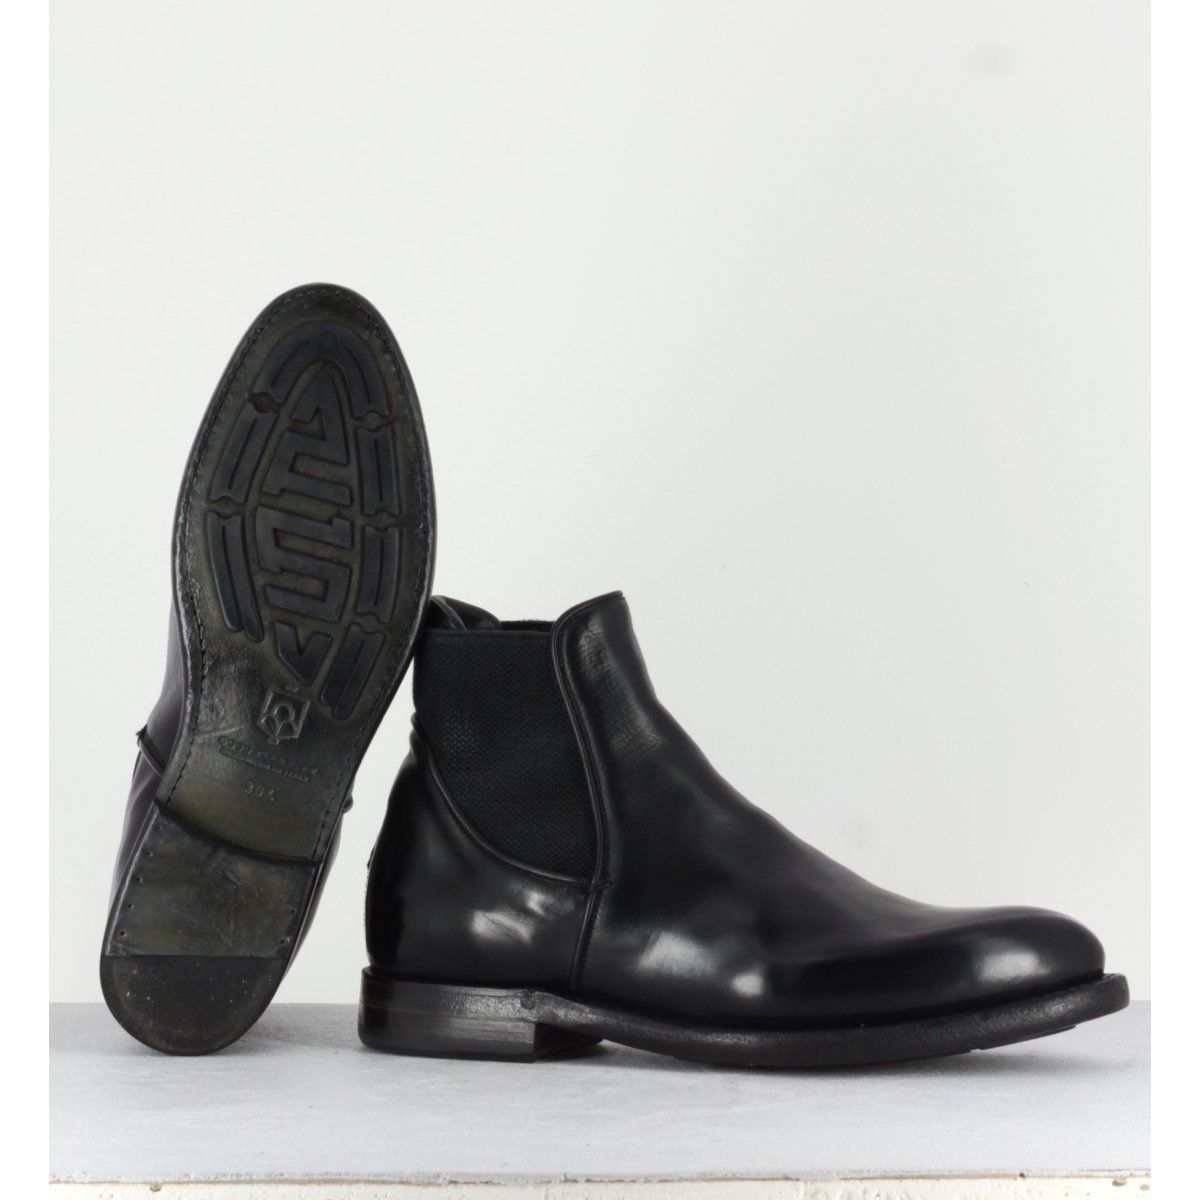 Bottines plates en cuir noir Silvano Sassetti - 4049NERO